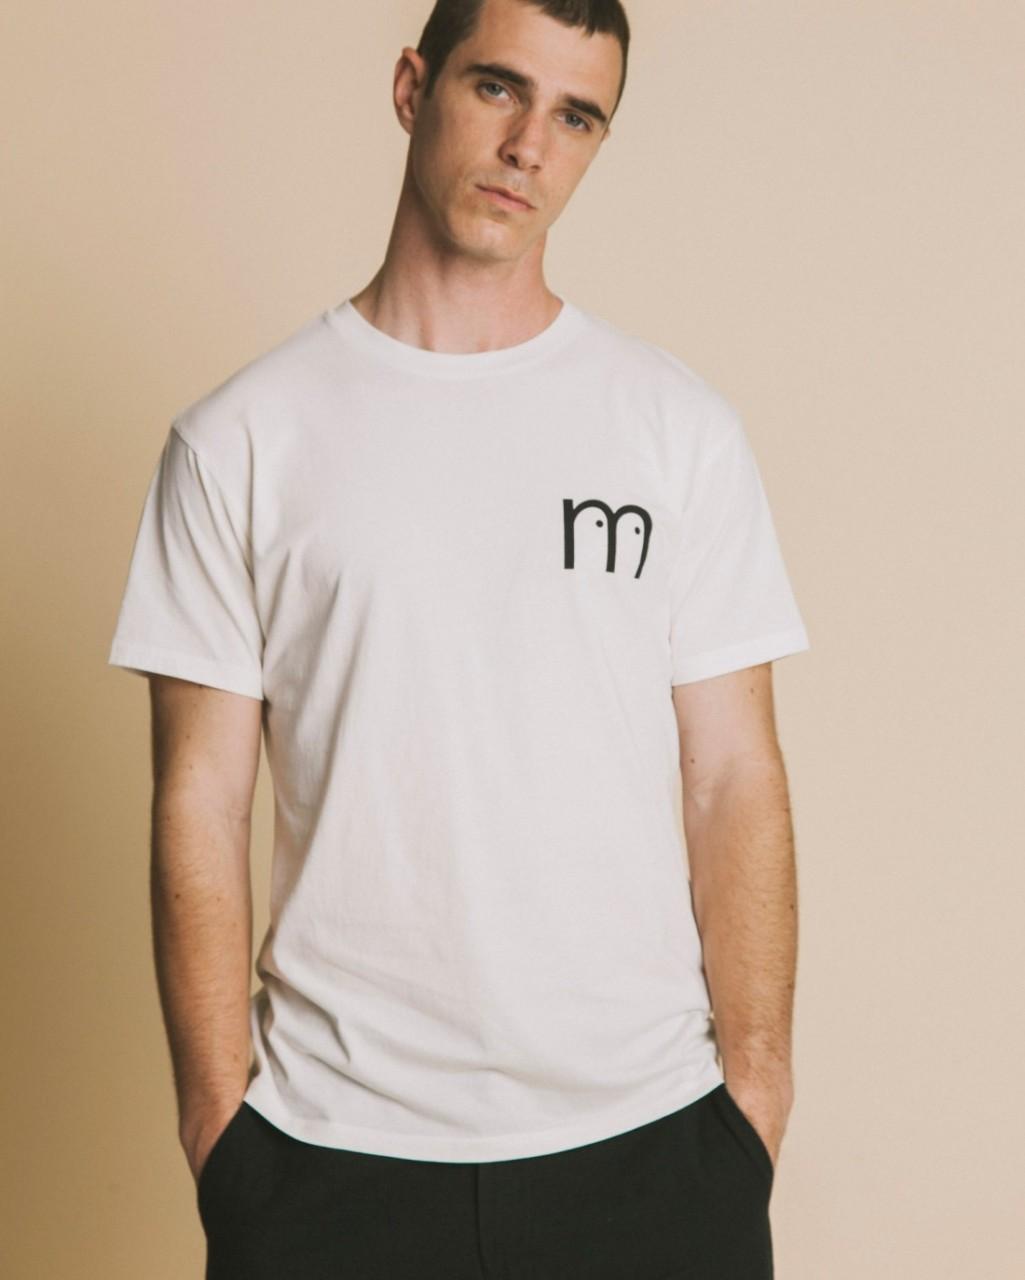 M EYES WHITE T-SHIRT SNOW WHITE